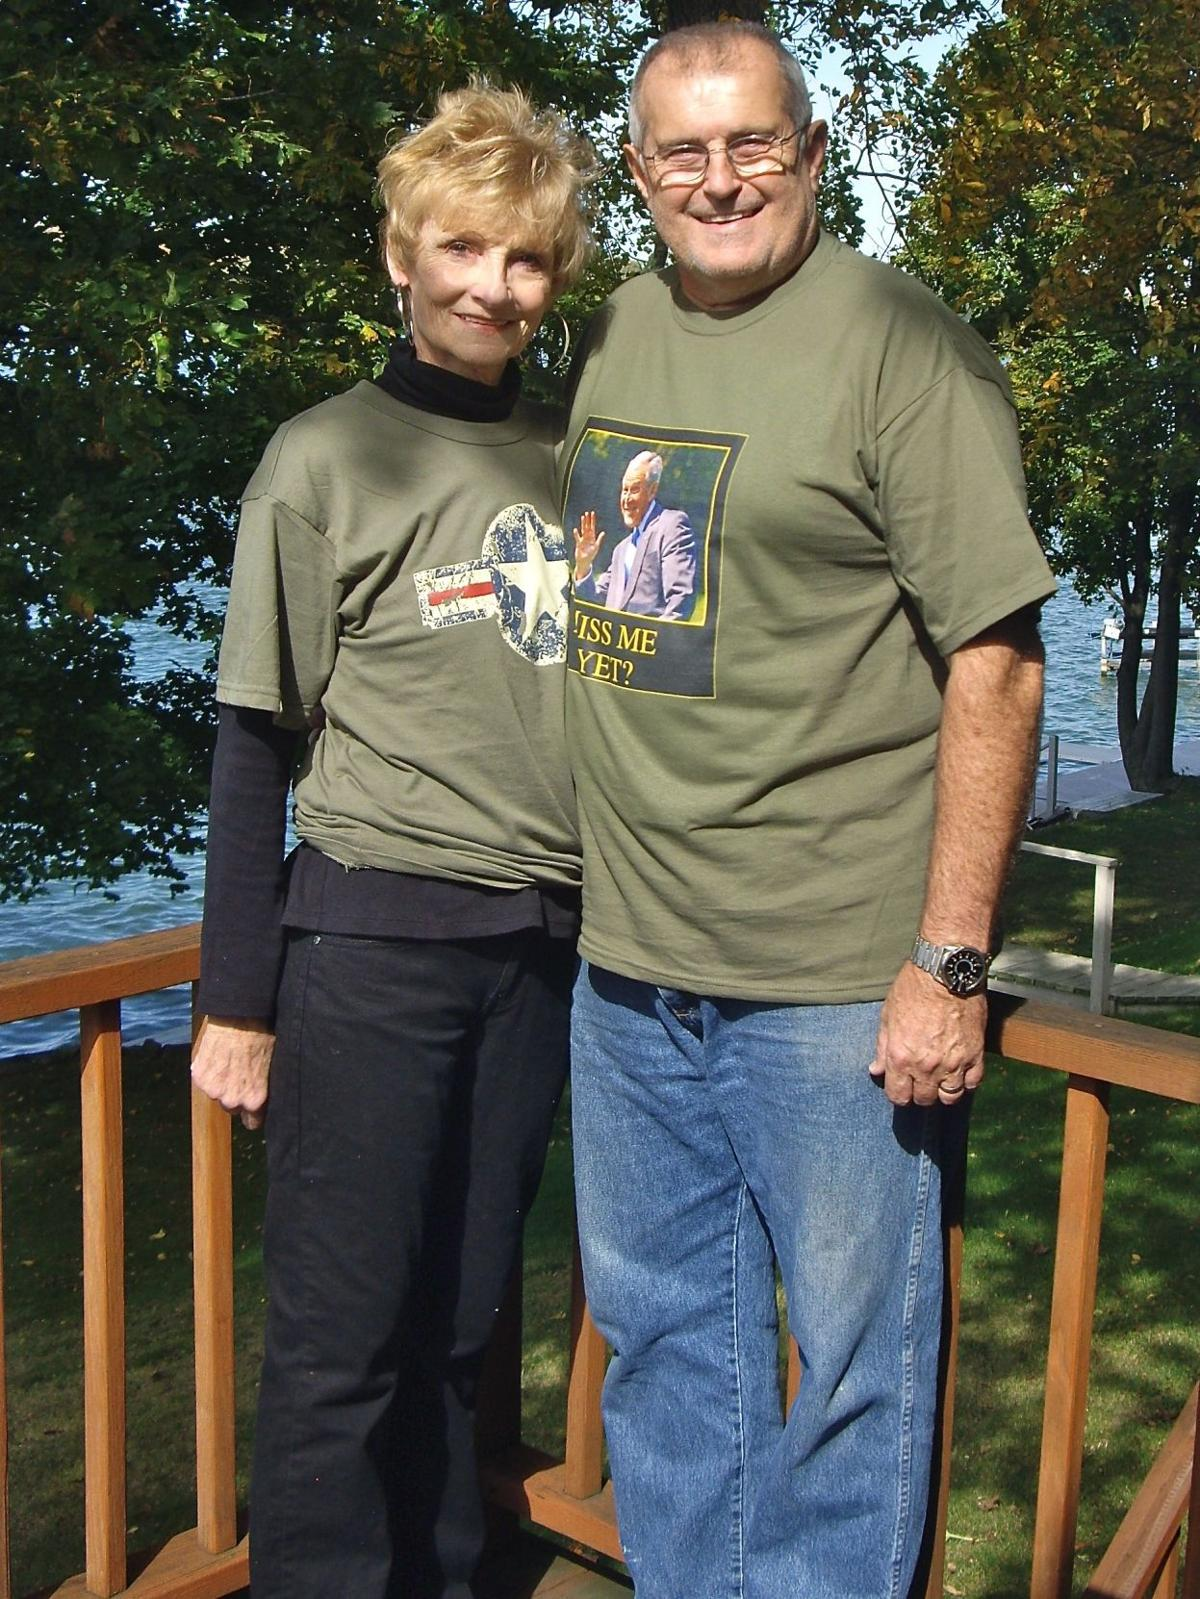 Ron and Judie Richtsmeier